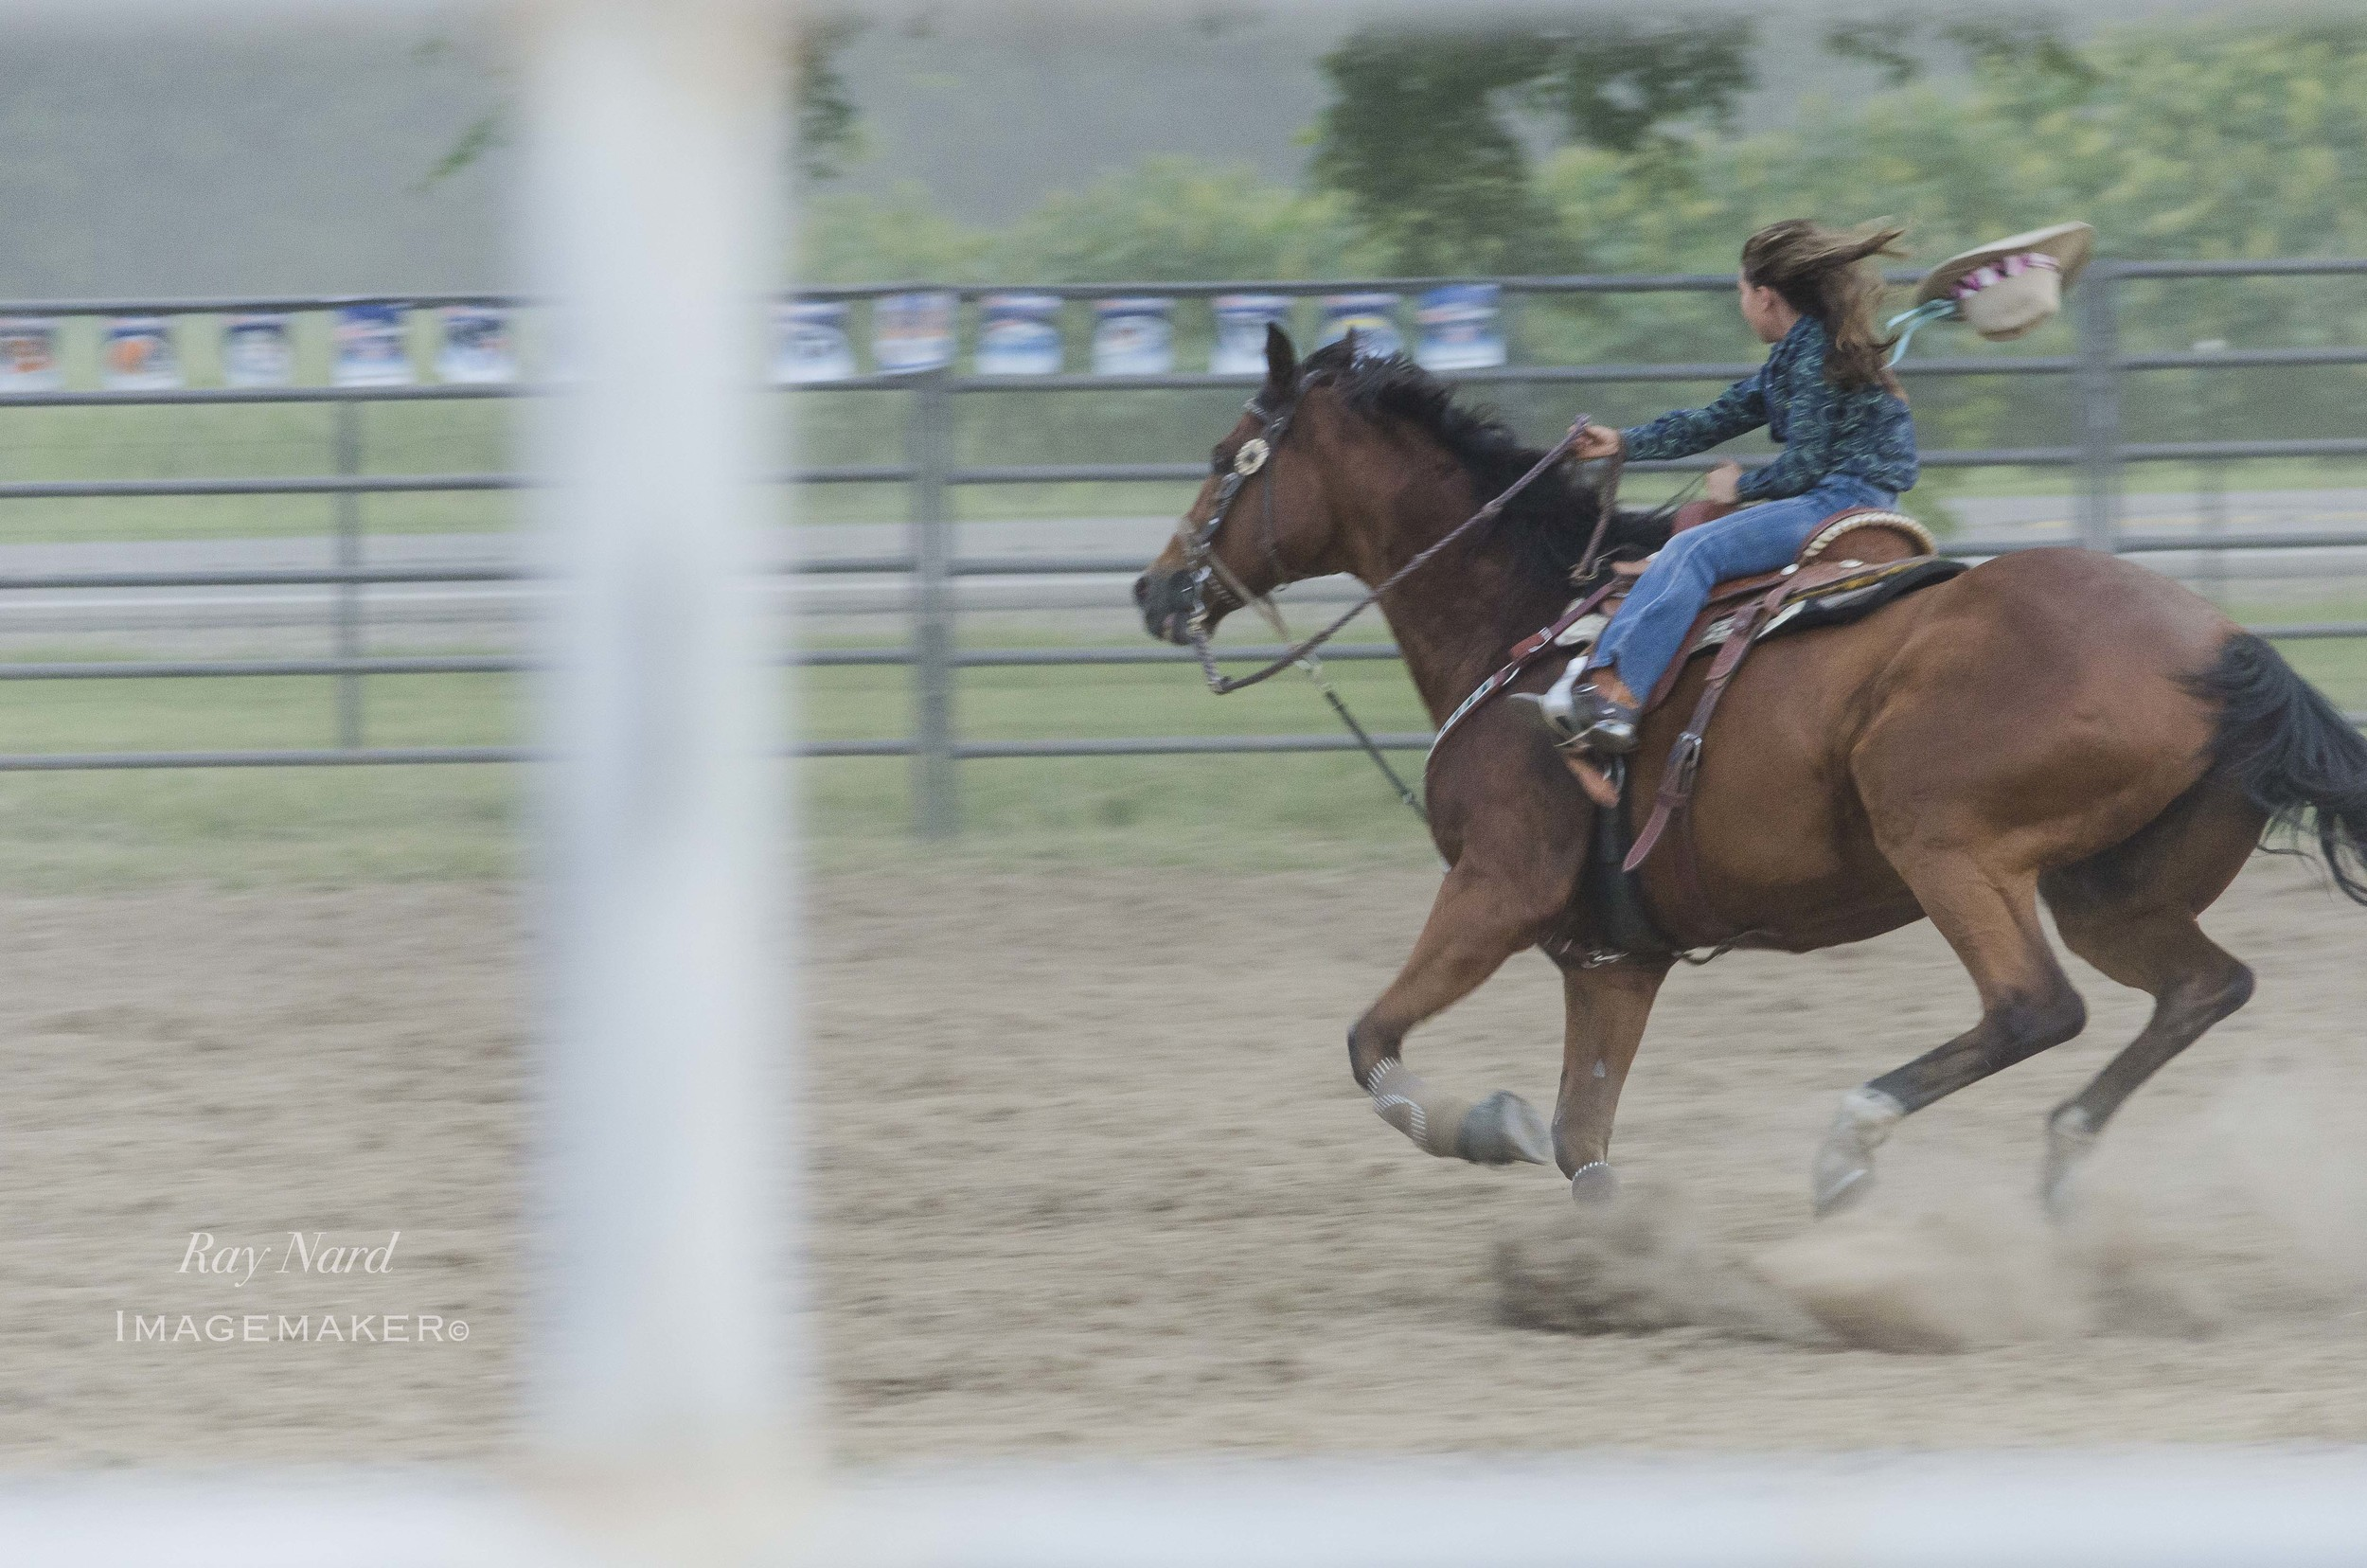 Rodeo Doc_4.JPG